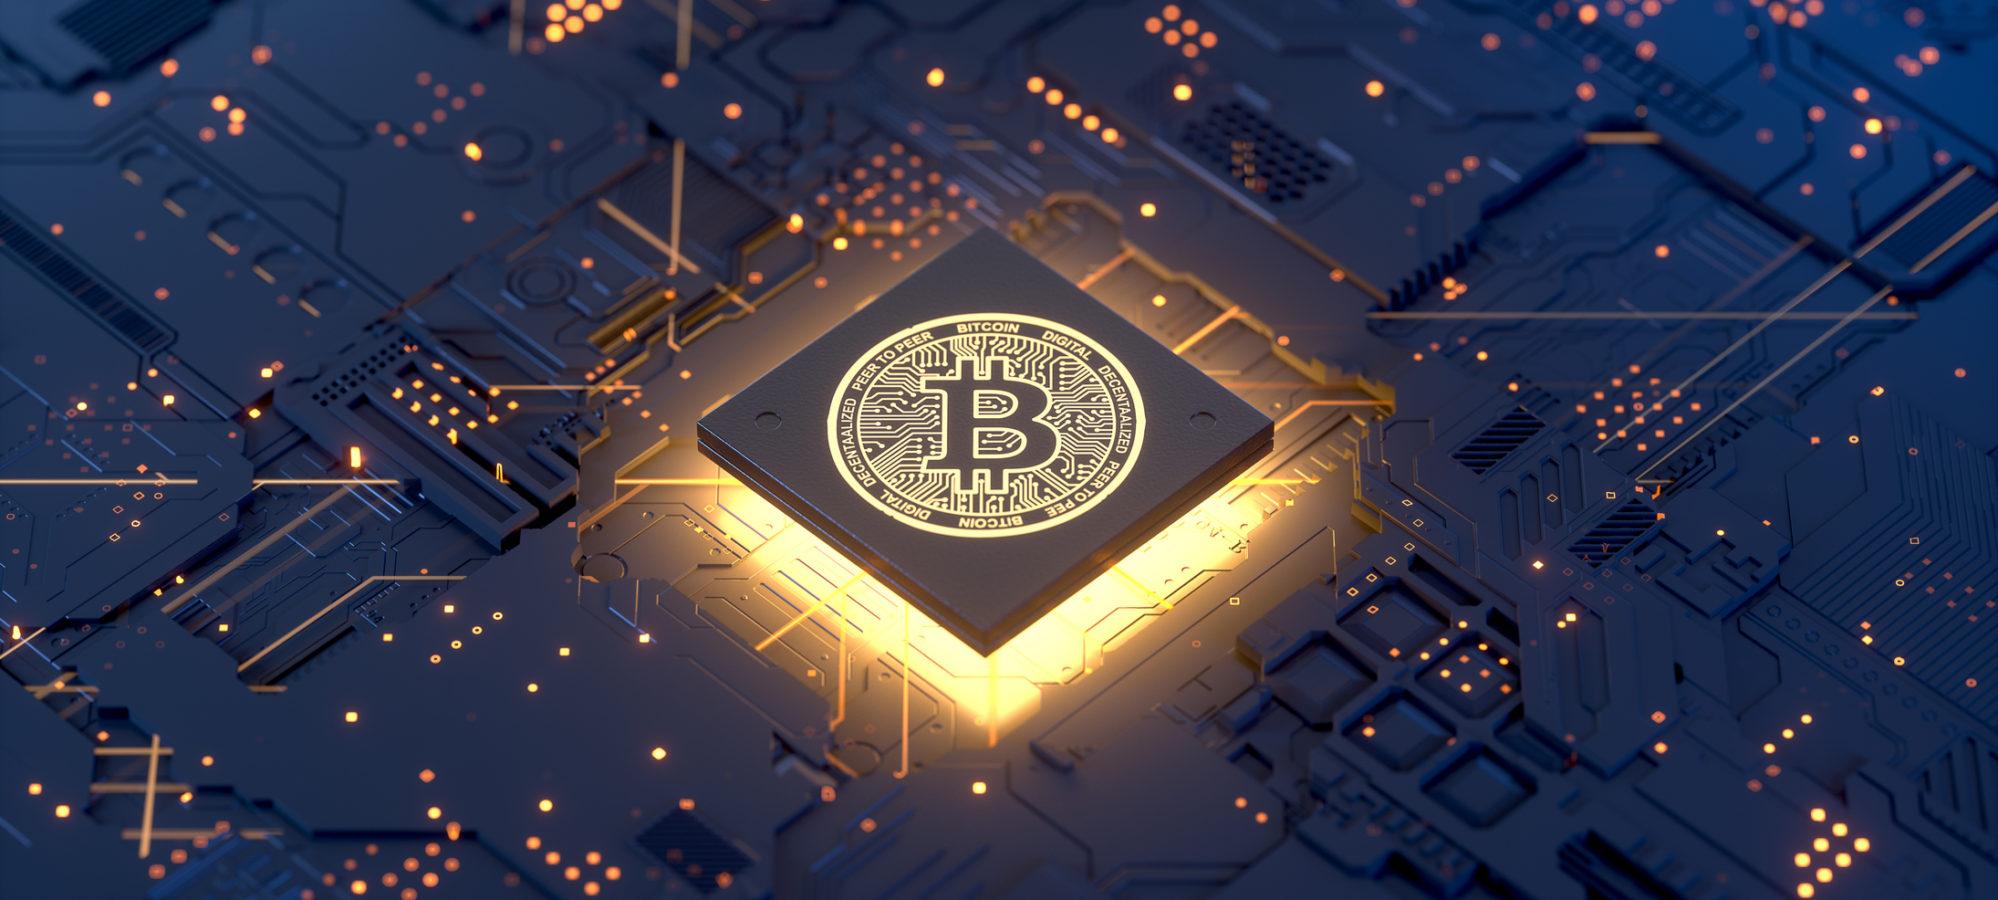 Visual representation of virtual currency bitcoin